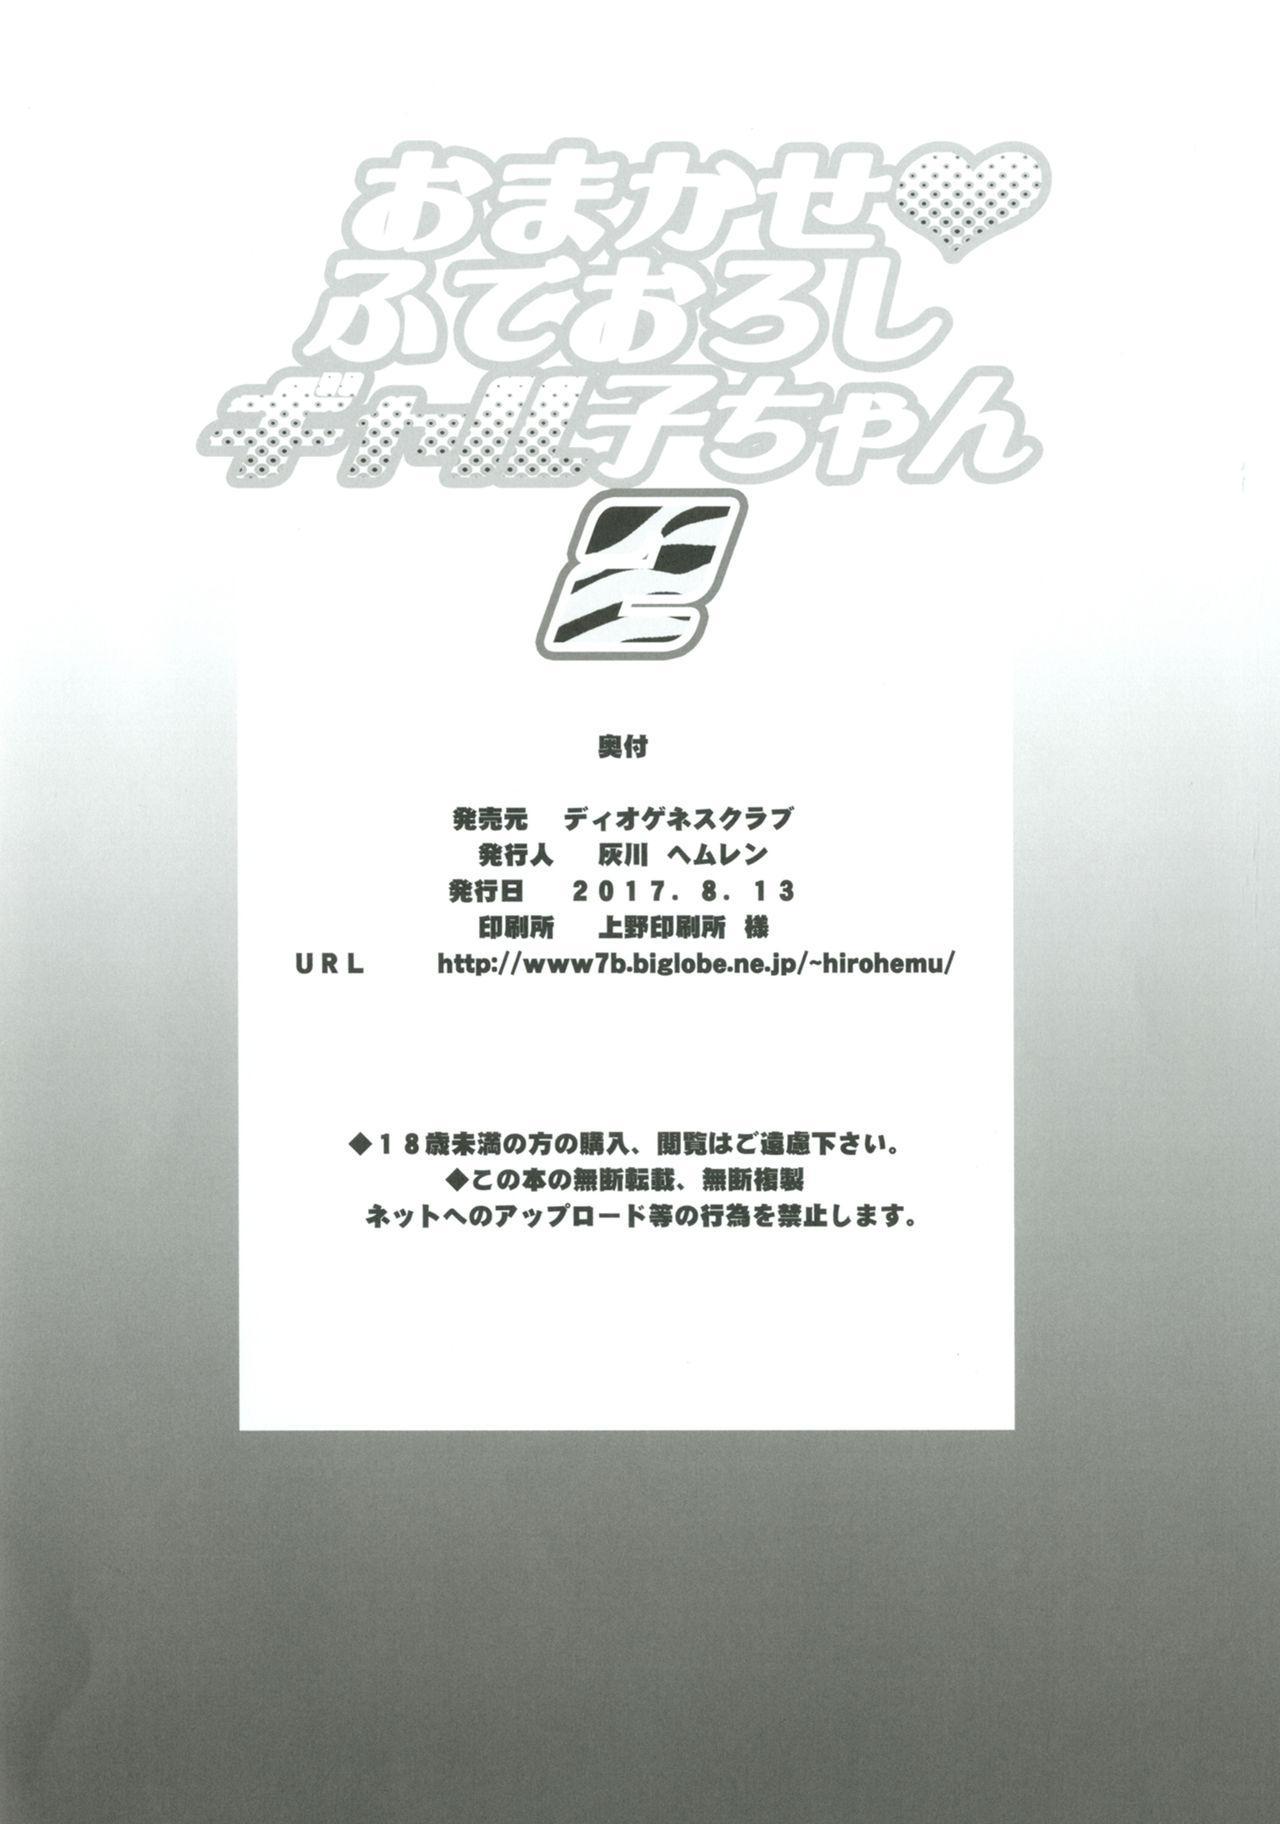 Omakase Fudeoroshi Galko-chan 2 24